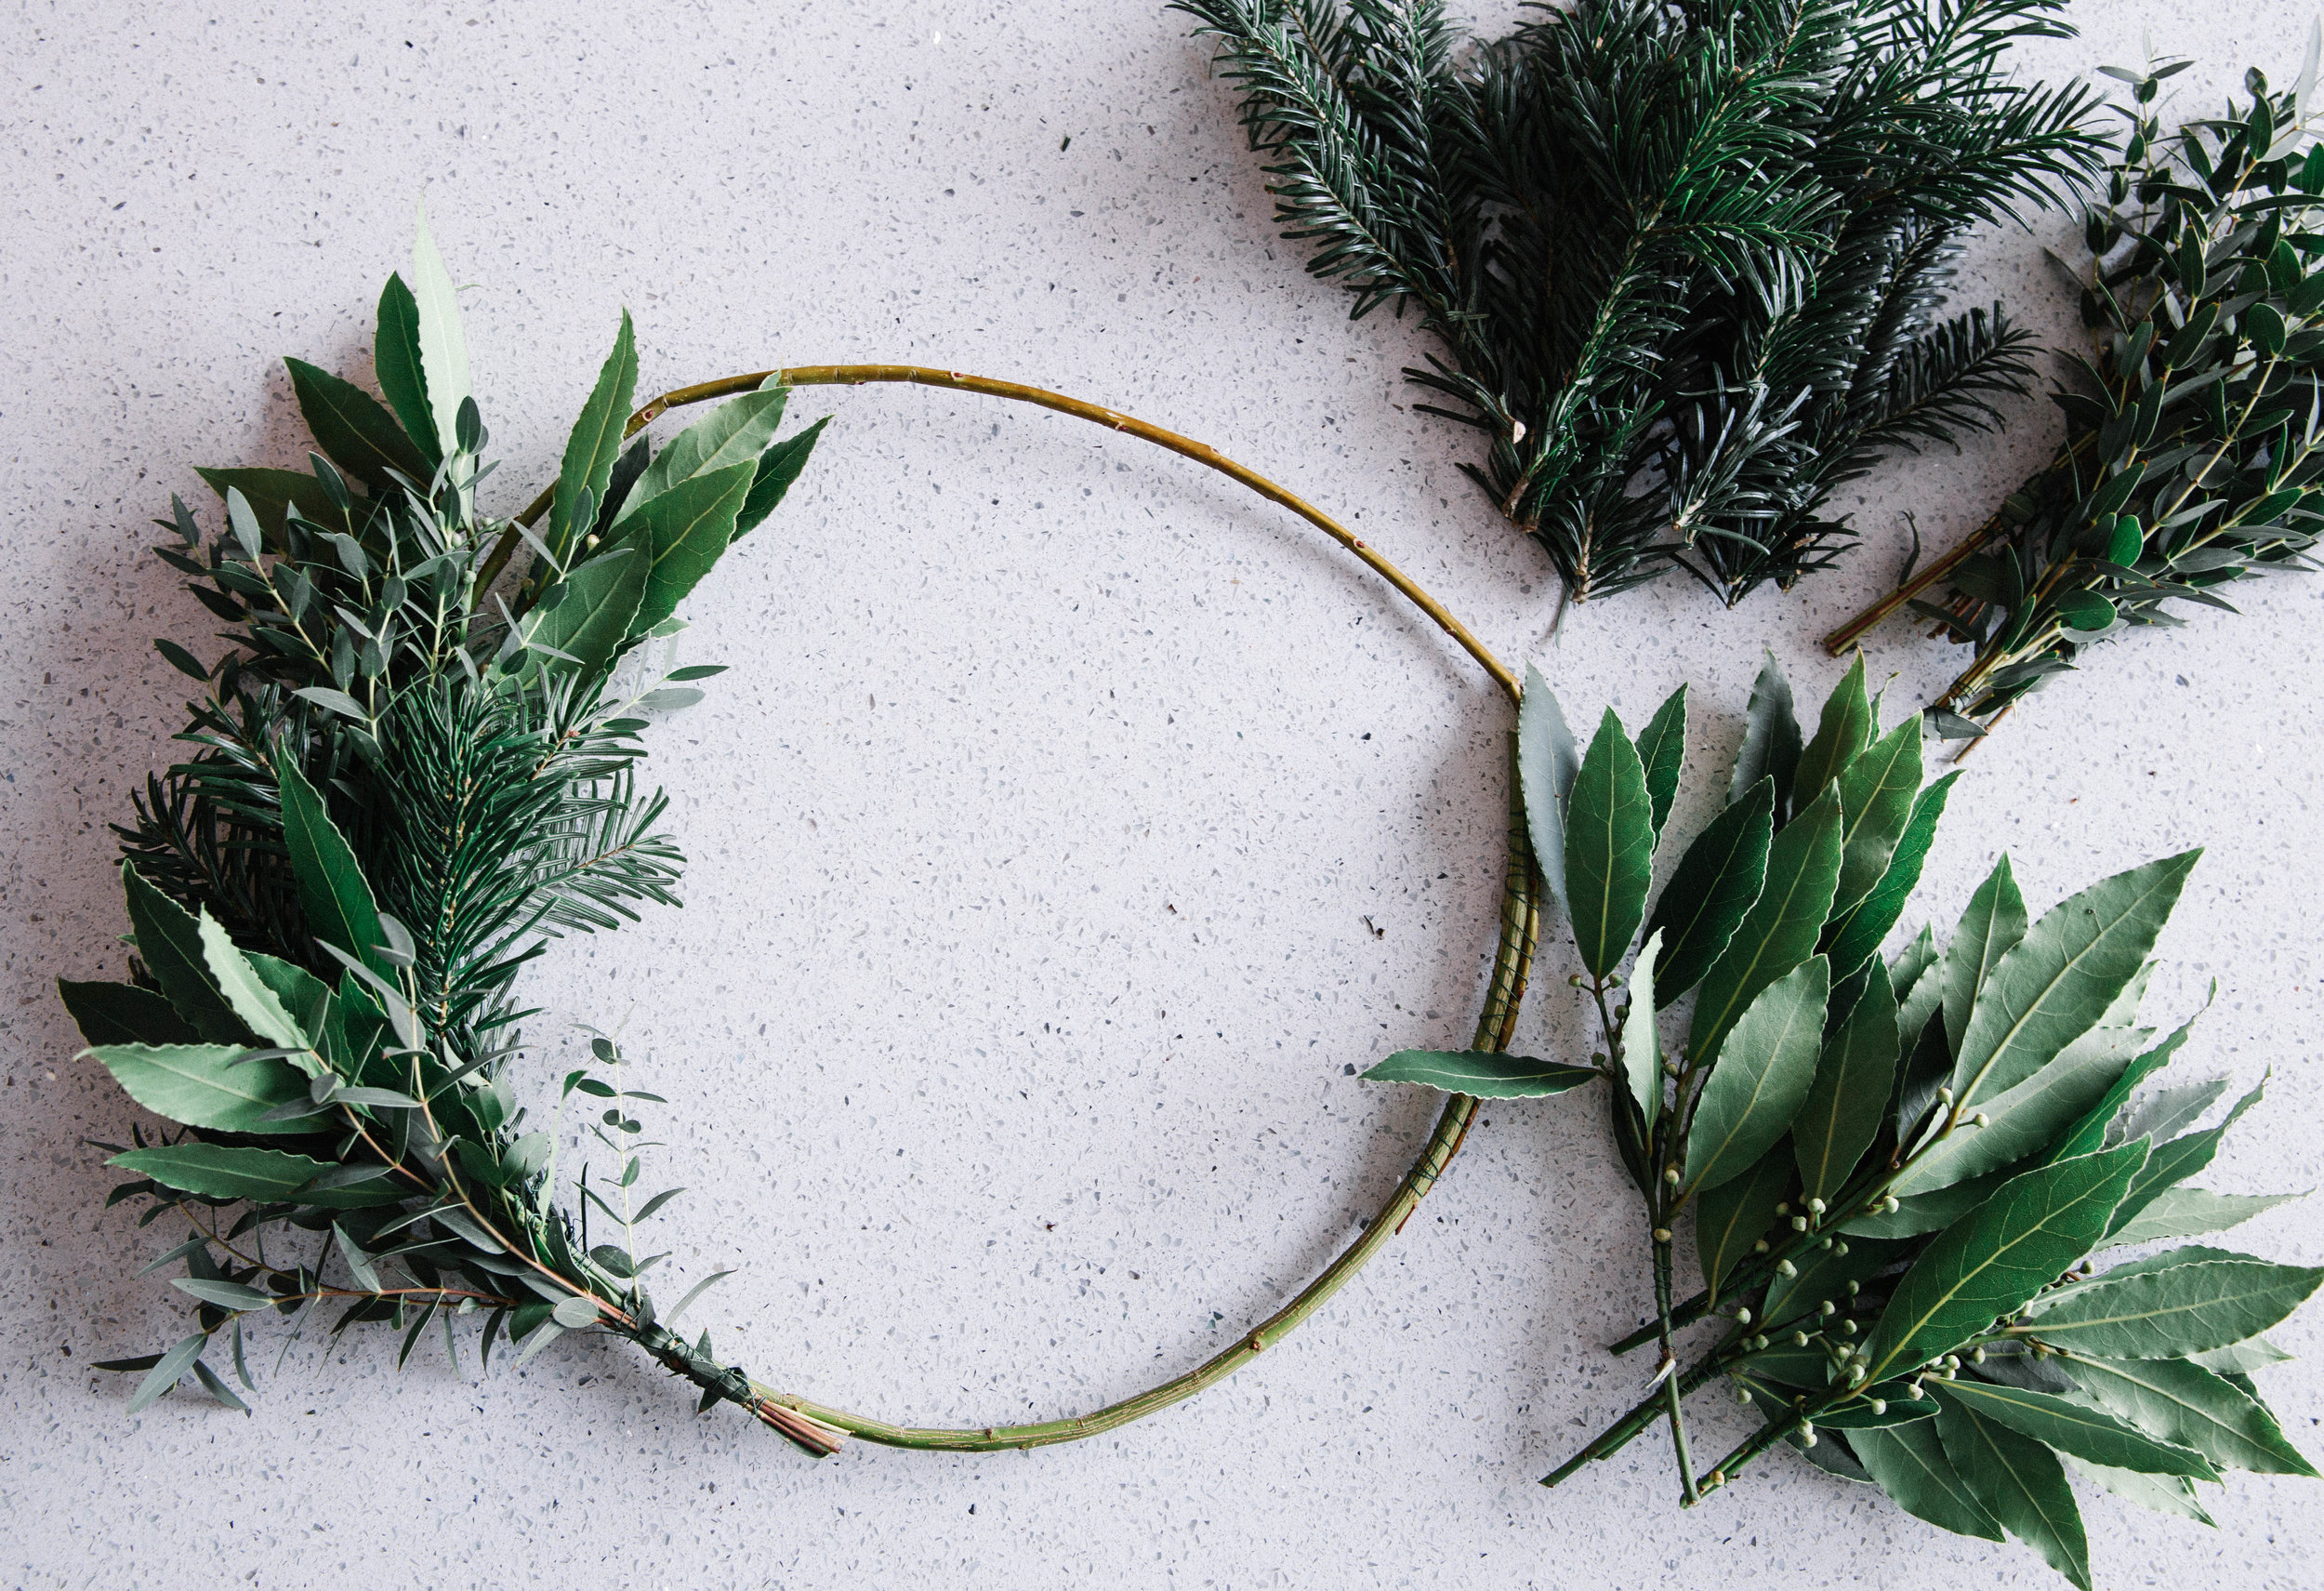 DIY-wreath-making